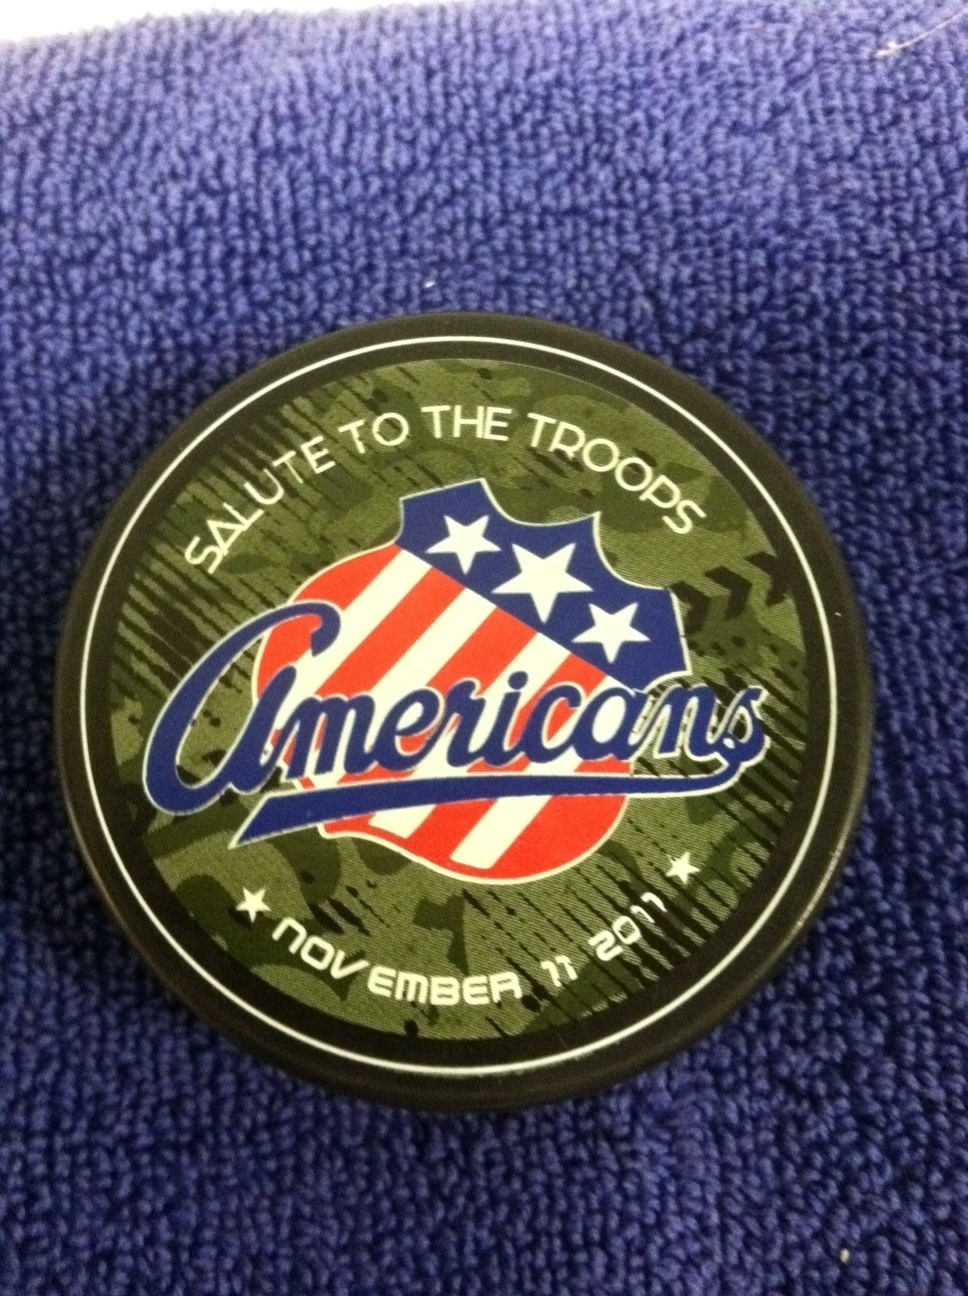 5 Reasons To Attend The Amerks vs Senators Game Tonight